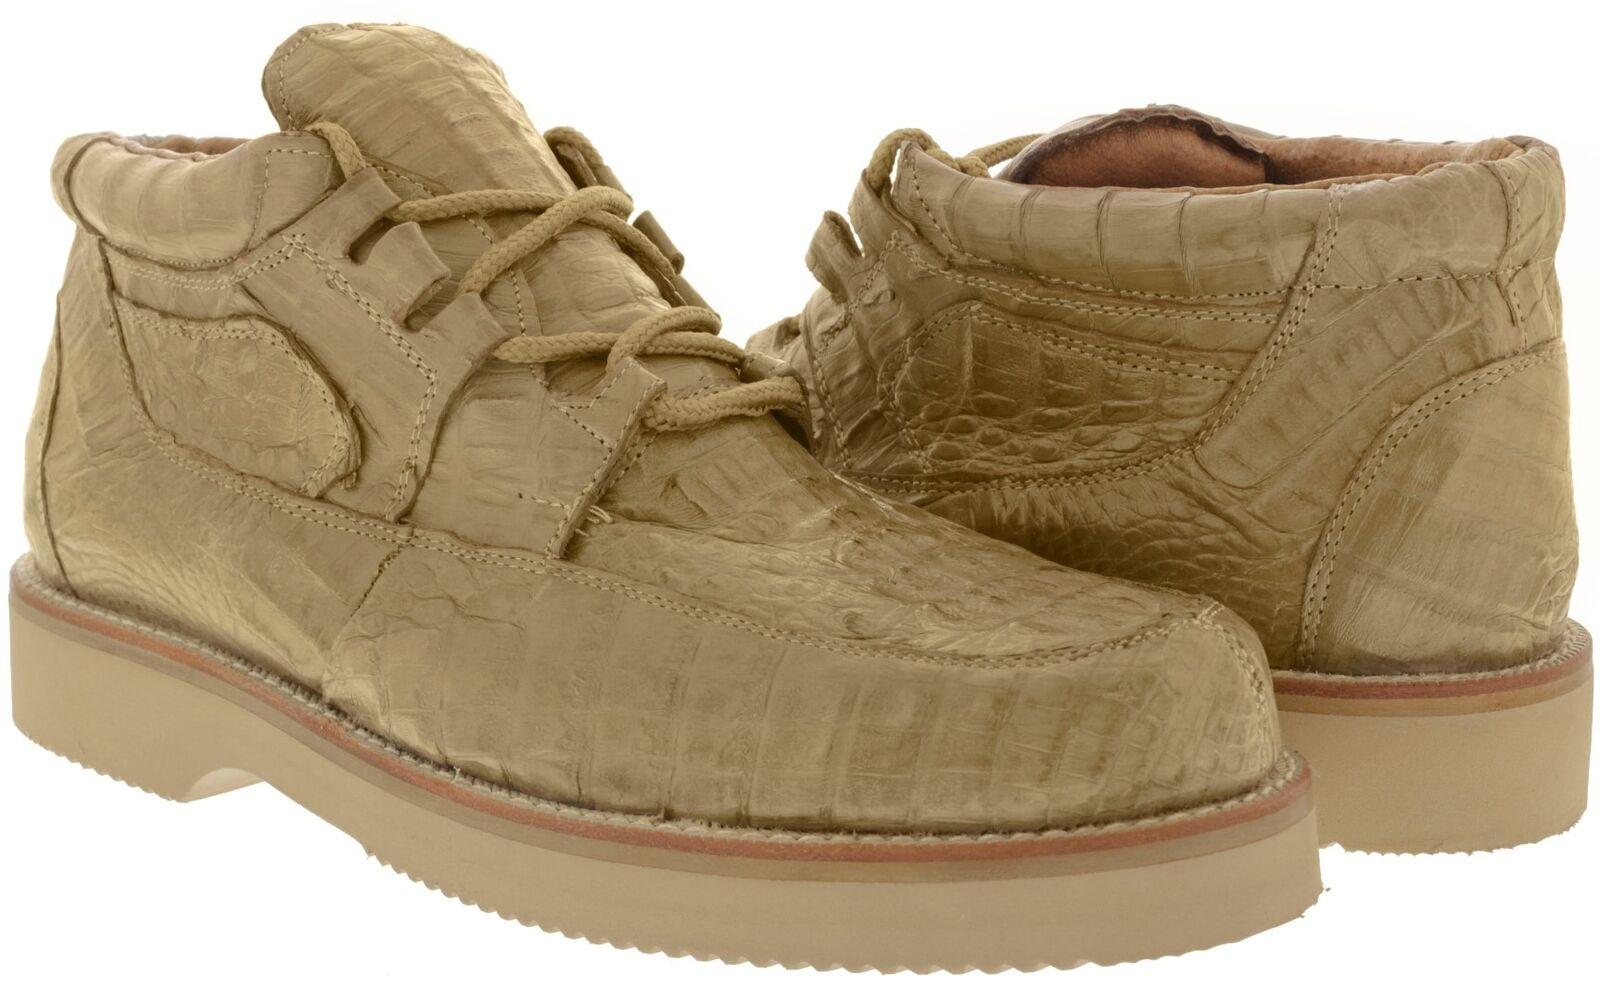 Mens El Presidente Sand Genuine Exotic Crocodile Skin Casual shoes Rodeo